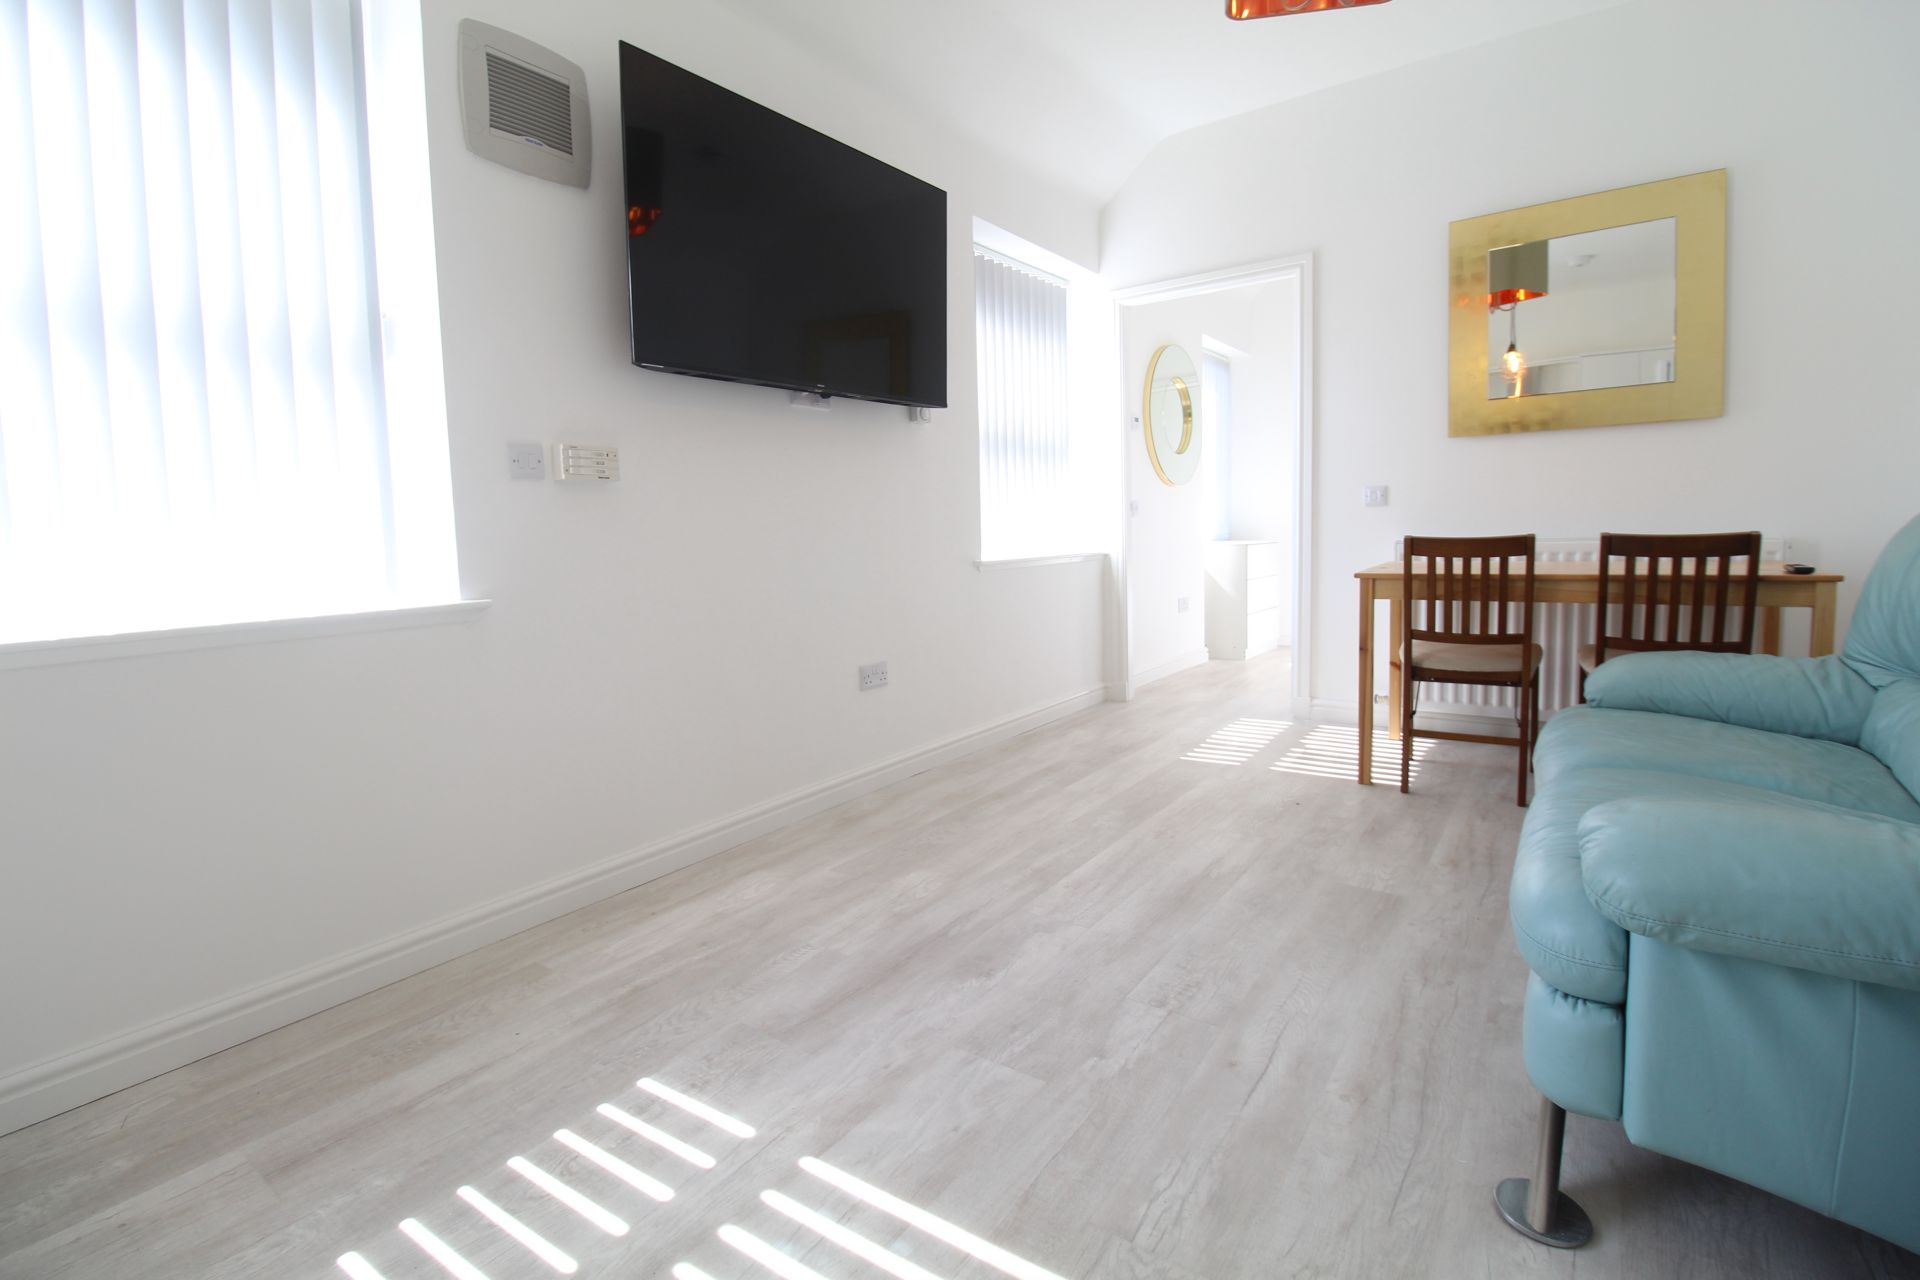 ARD-Properties-Development-Sites-Buy-Homes-Rent-Aberdeenshire-Rentals-Apartment-C-Loanhead-Terrace-Aberdeen-Banner (7)